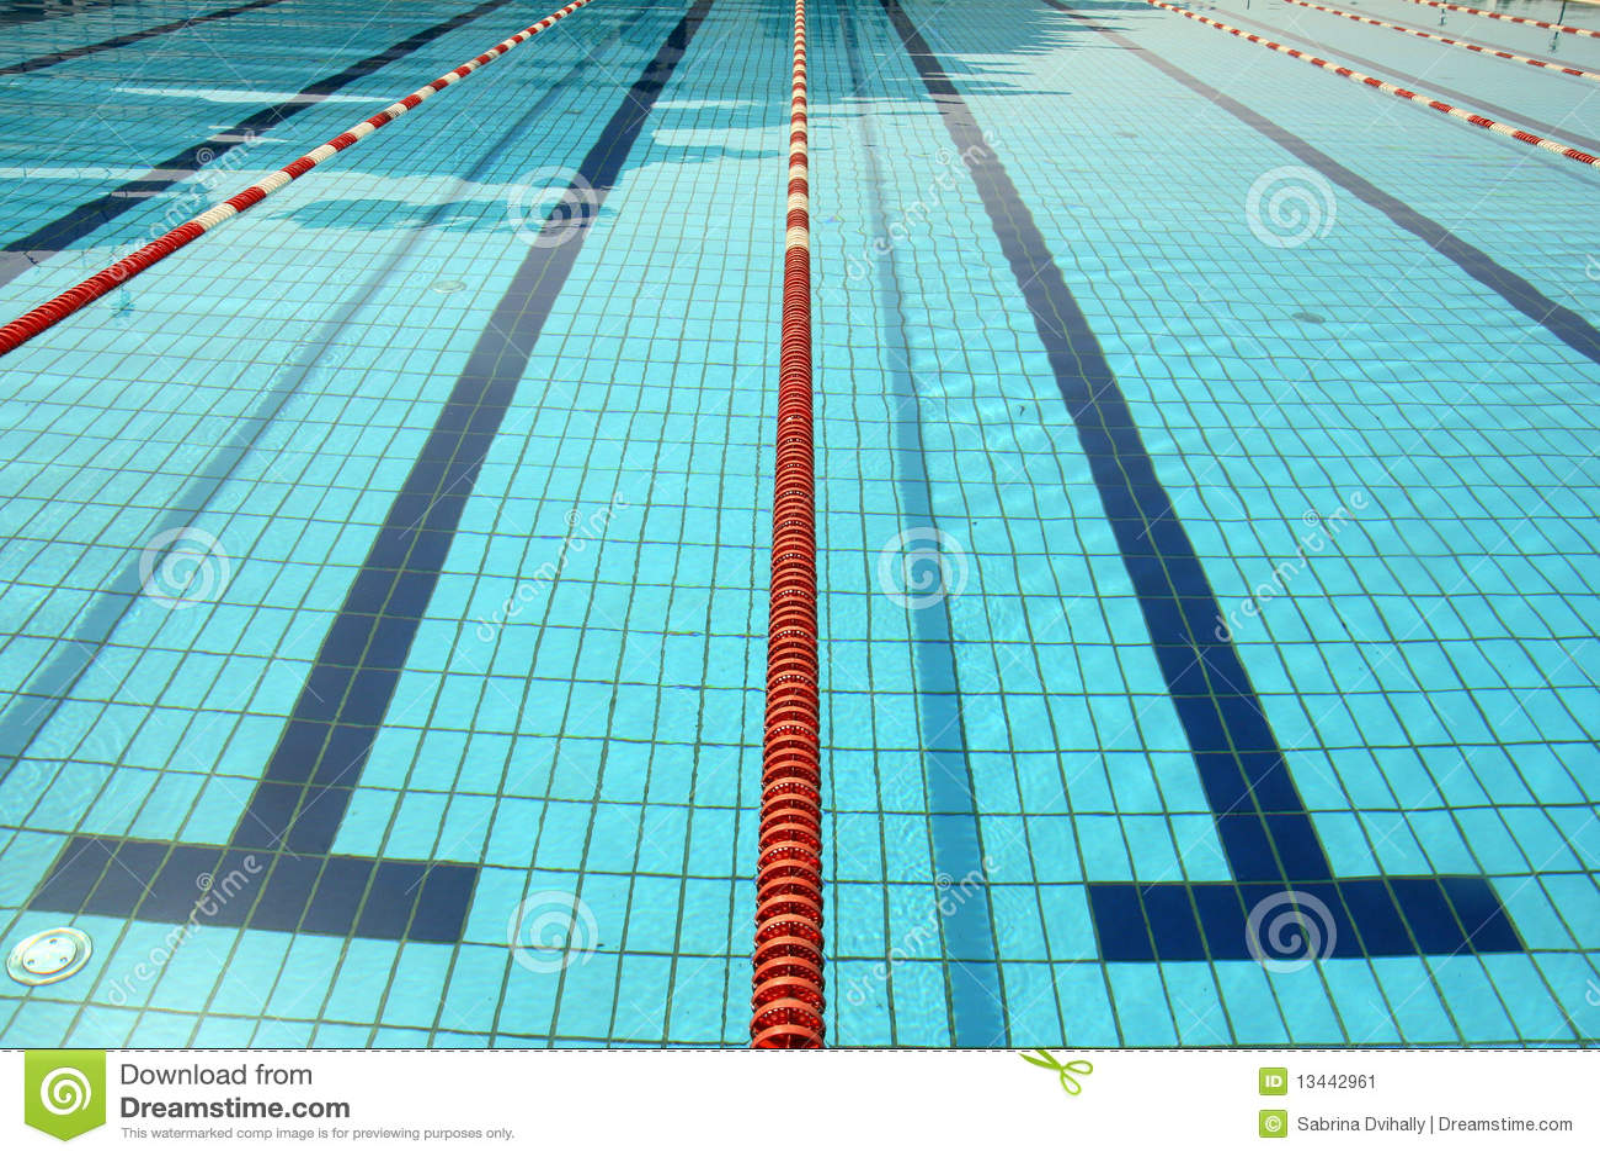 Swimming Pool Lines Amp Water Stock Image Image 13442961